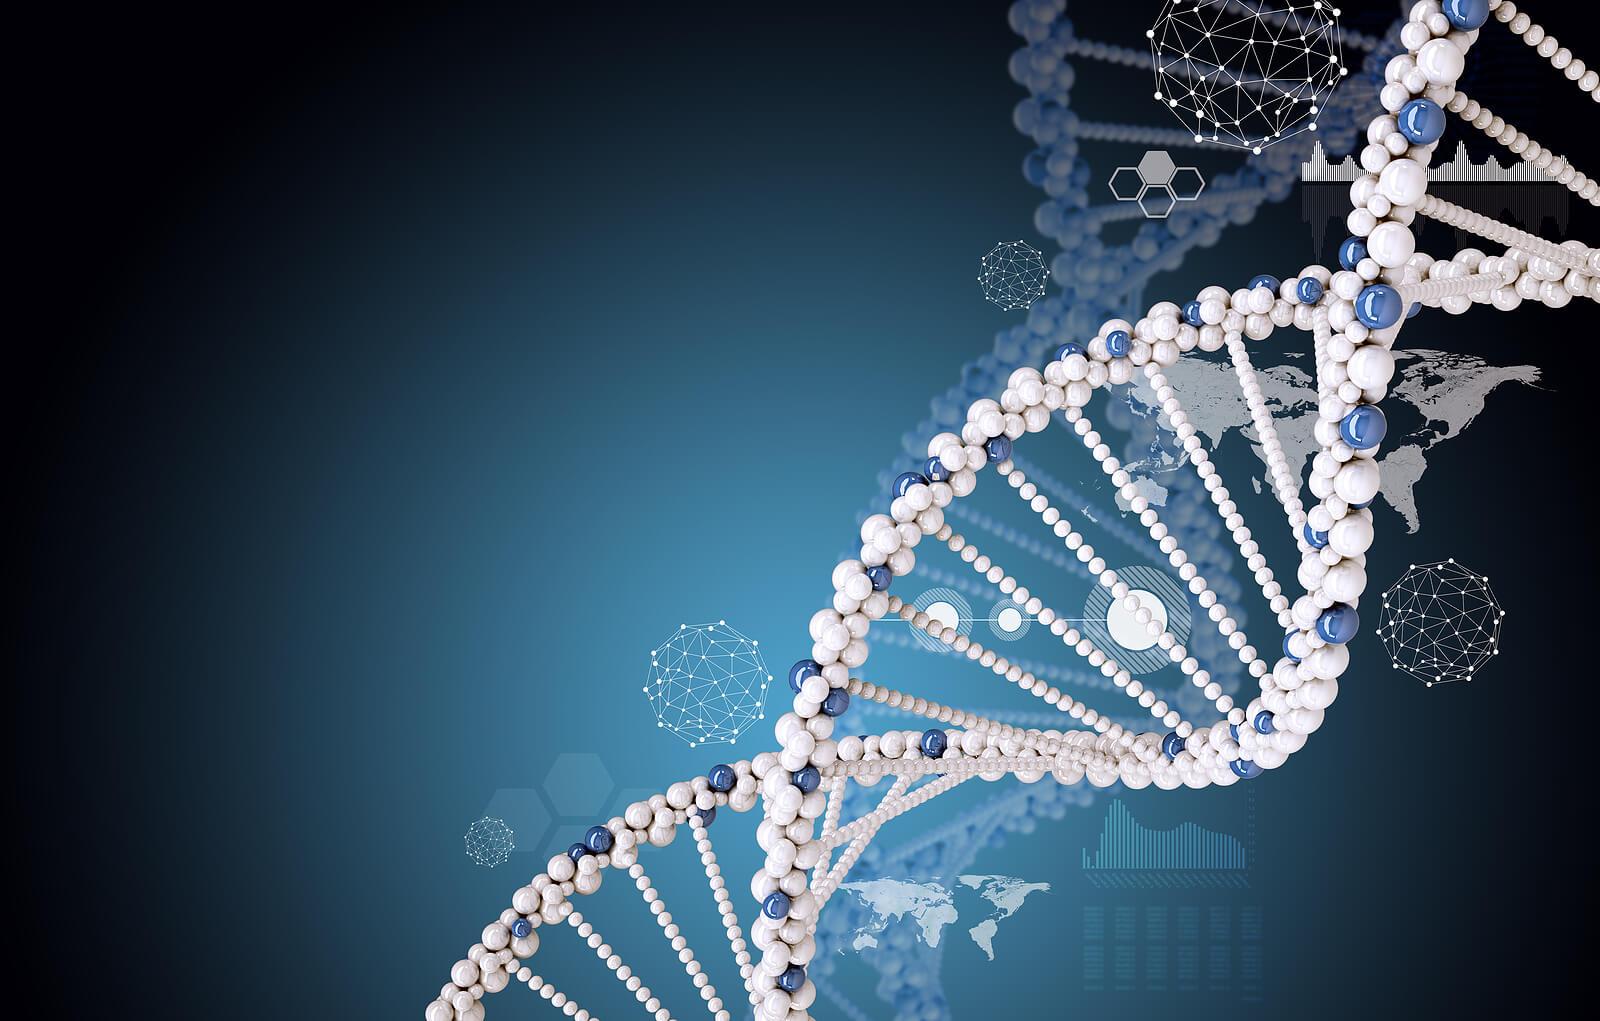 Genes and type 2 diabetes